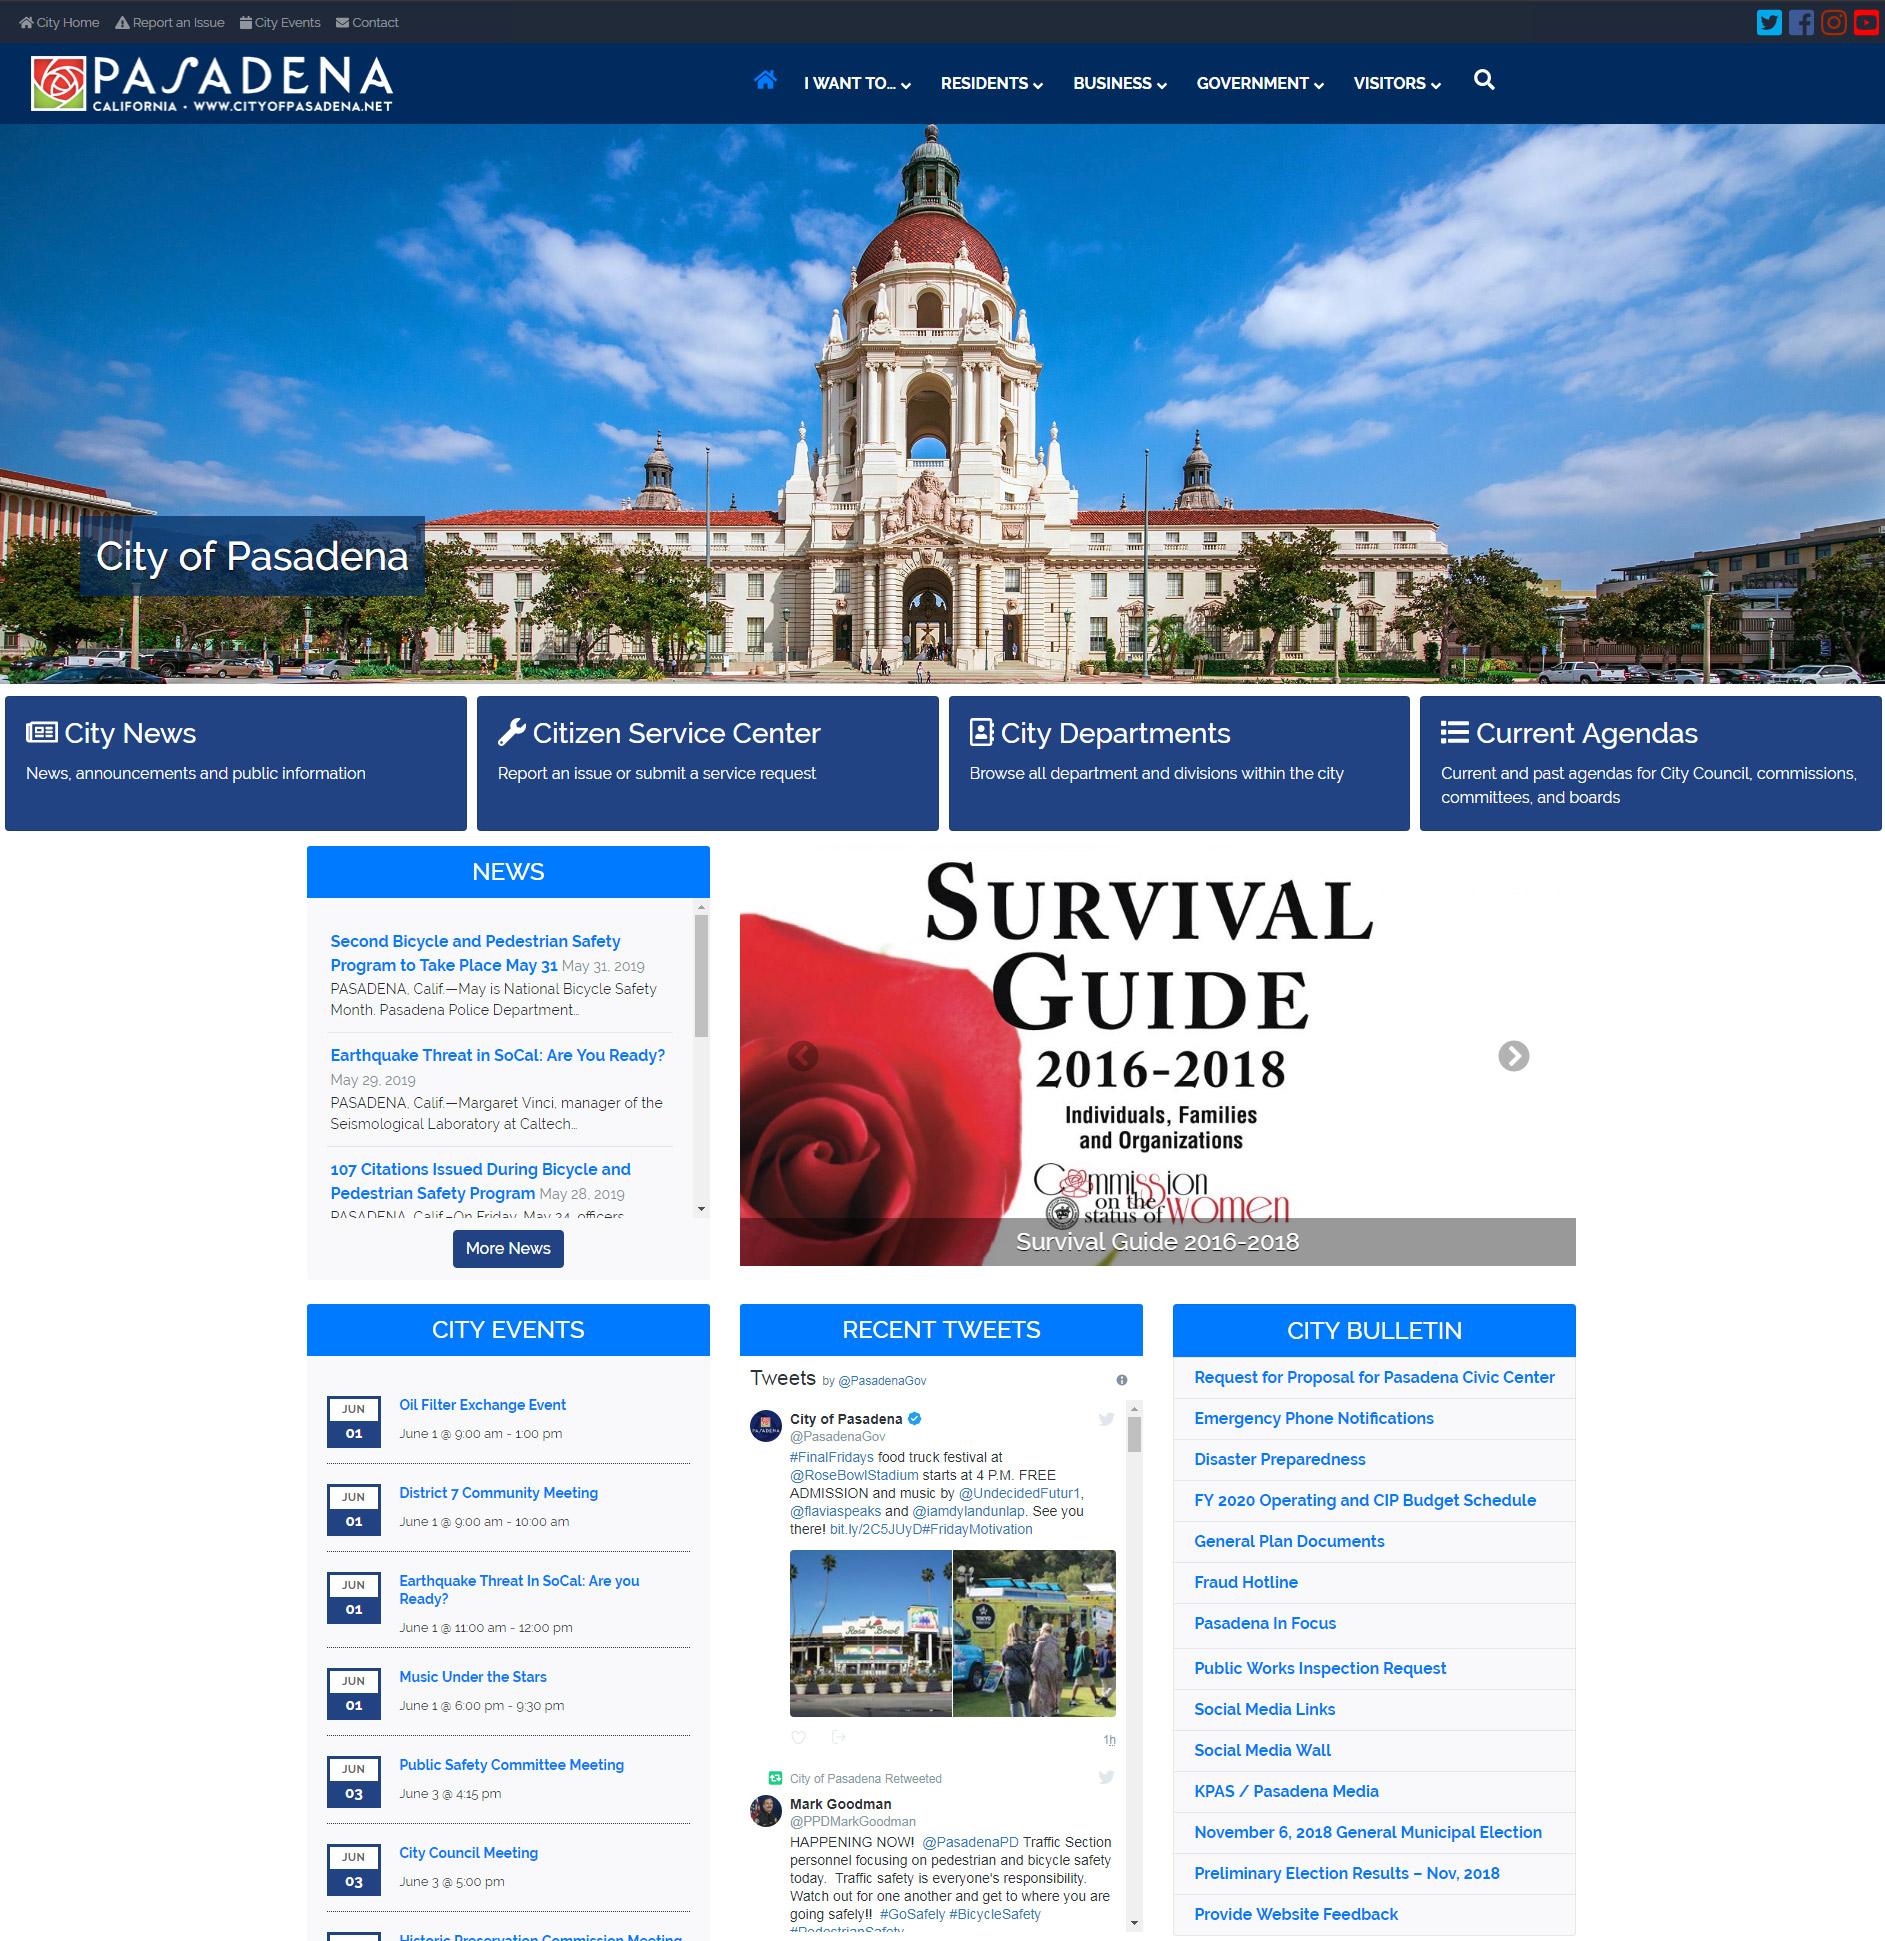 The Official Website of City of Pasadena, California image